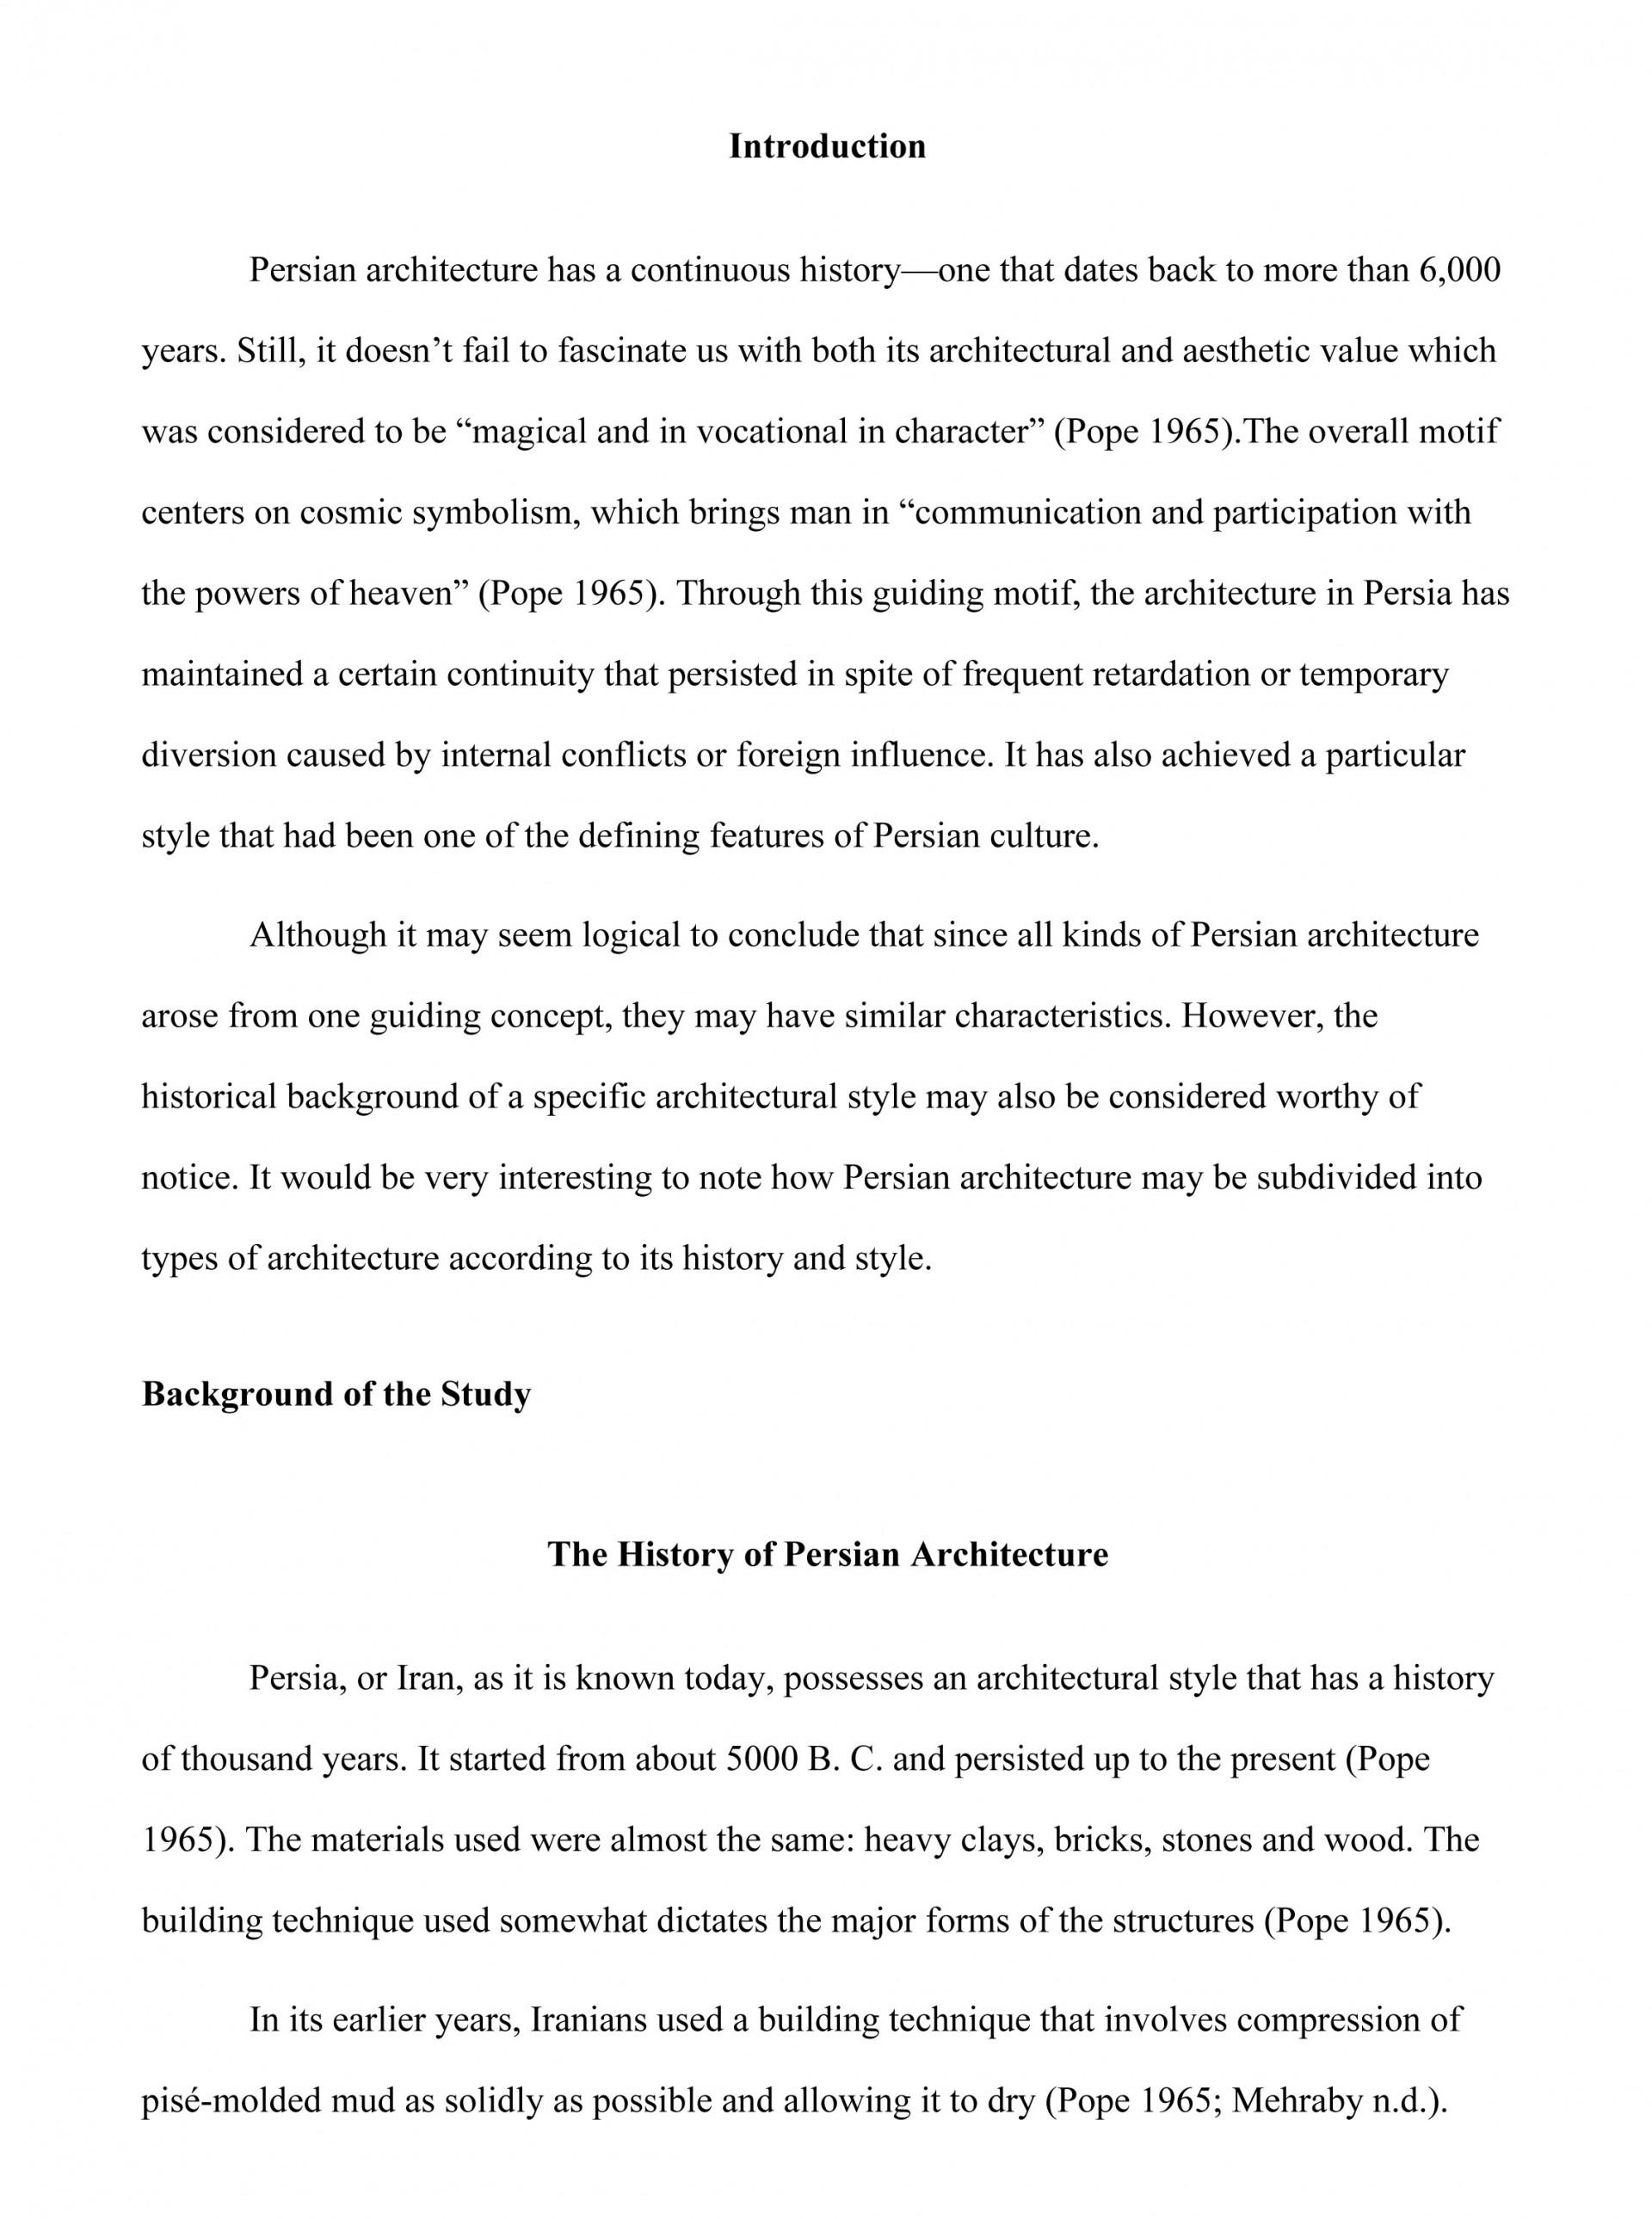 002 Essay On Career Dissertation Sample Breathtaking Goals And Aspirations Choosing A Path 1920